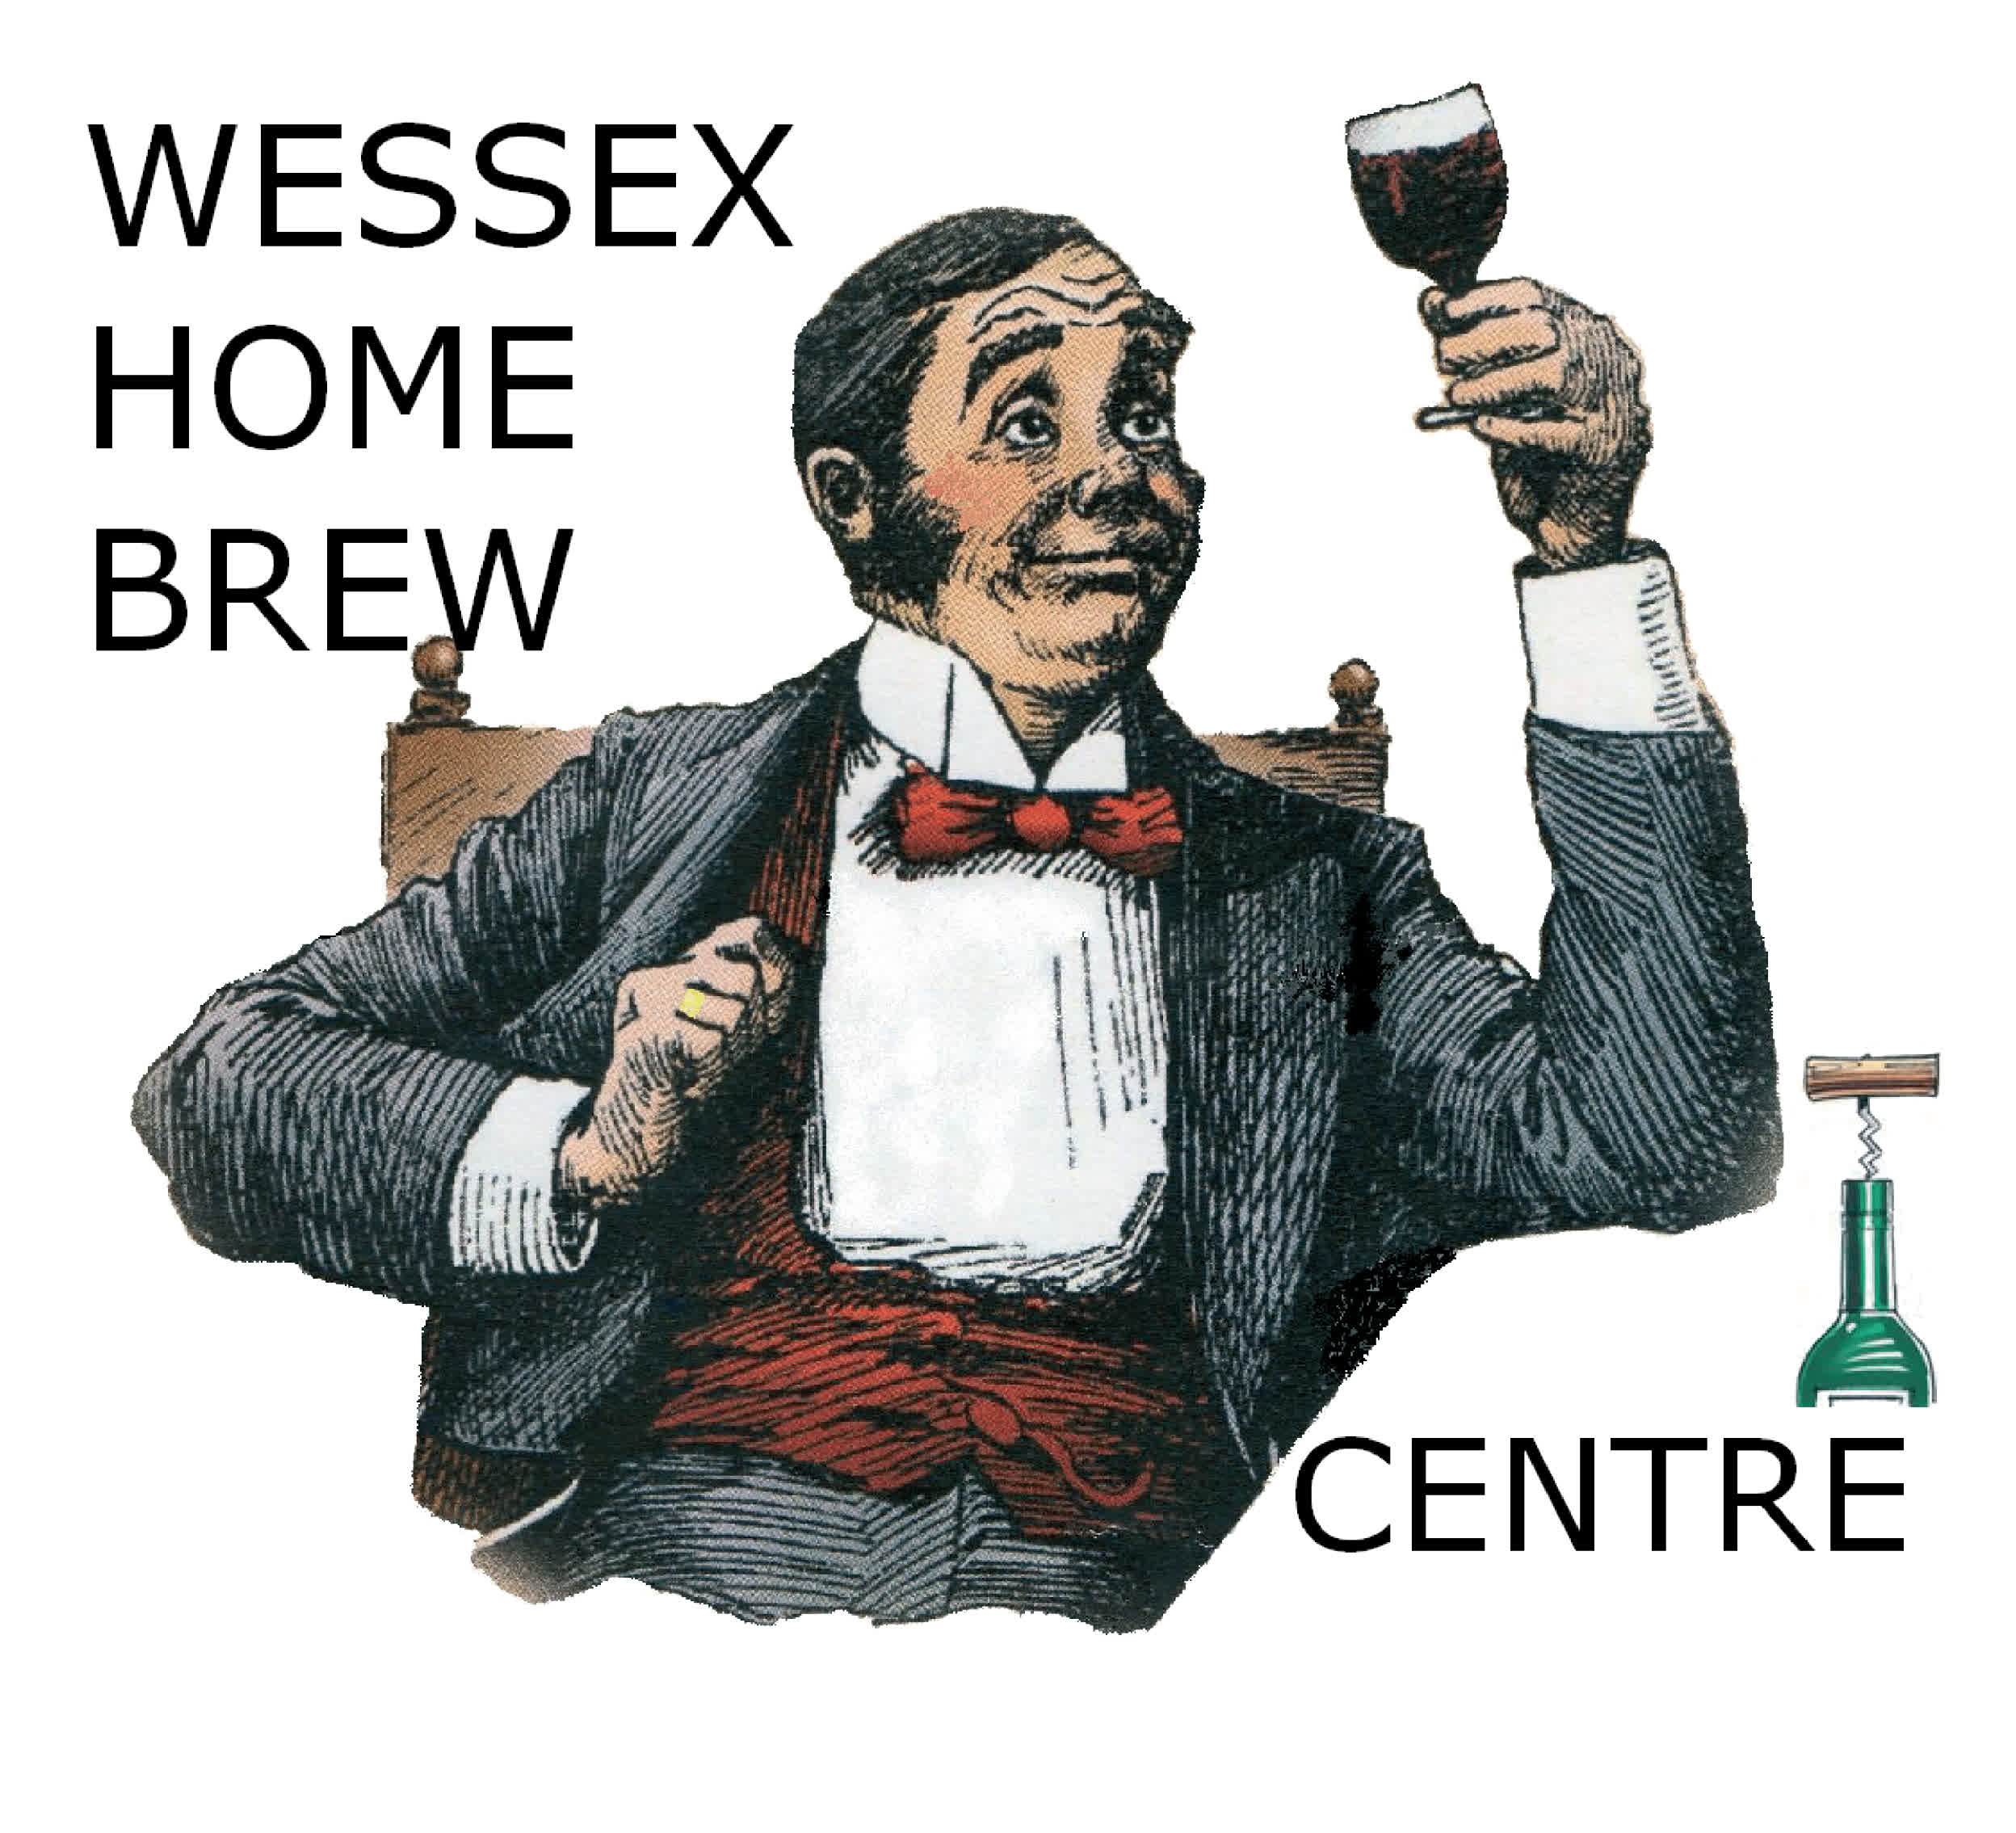 Thomas Hardy's Ale, hardy's ale, vintage beers, vintage ales, breweriana, vintage GIFs